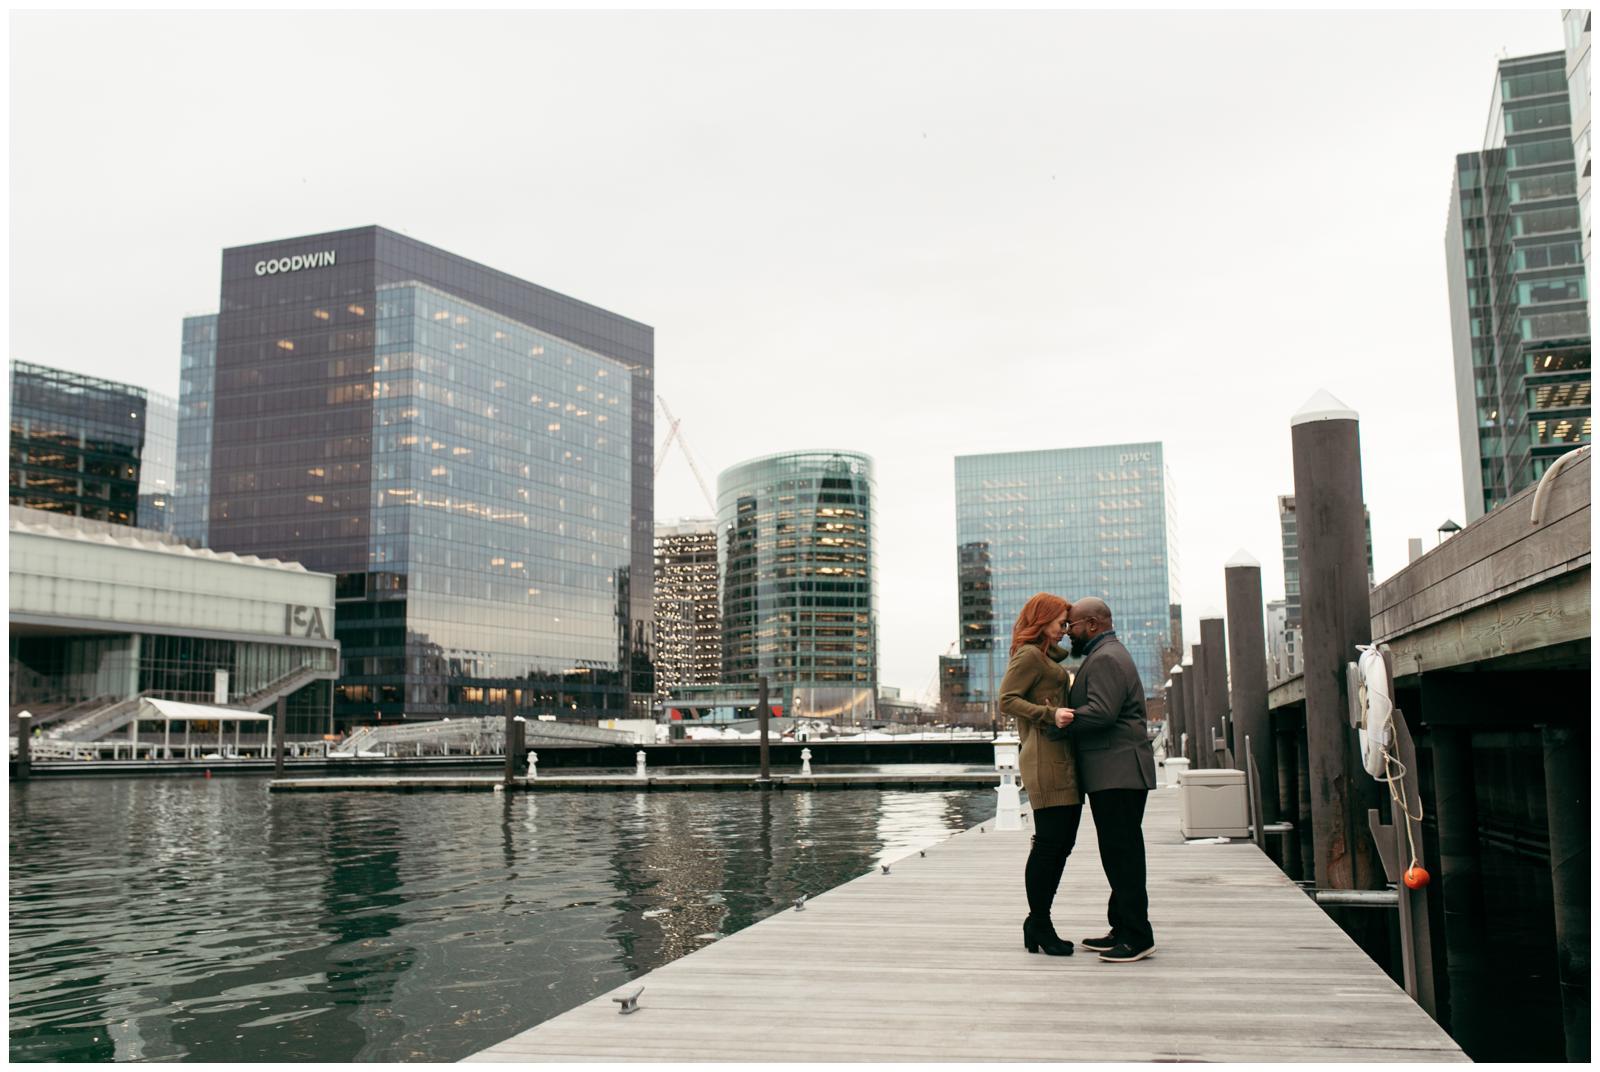 Seaport district Boston portraits